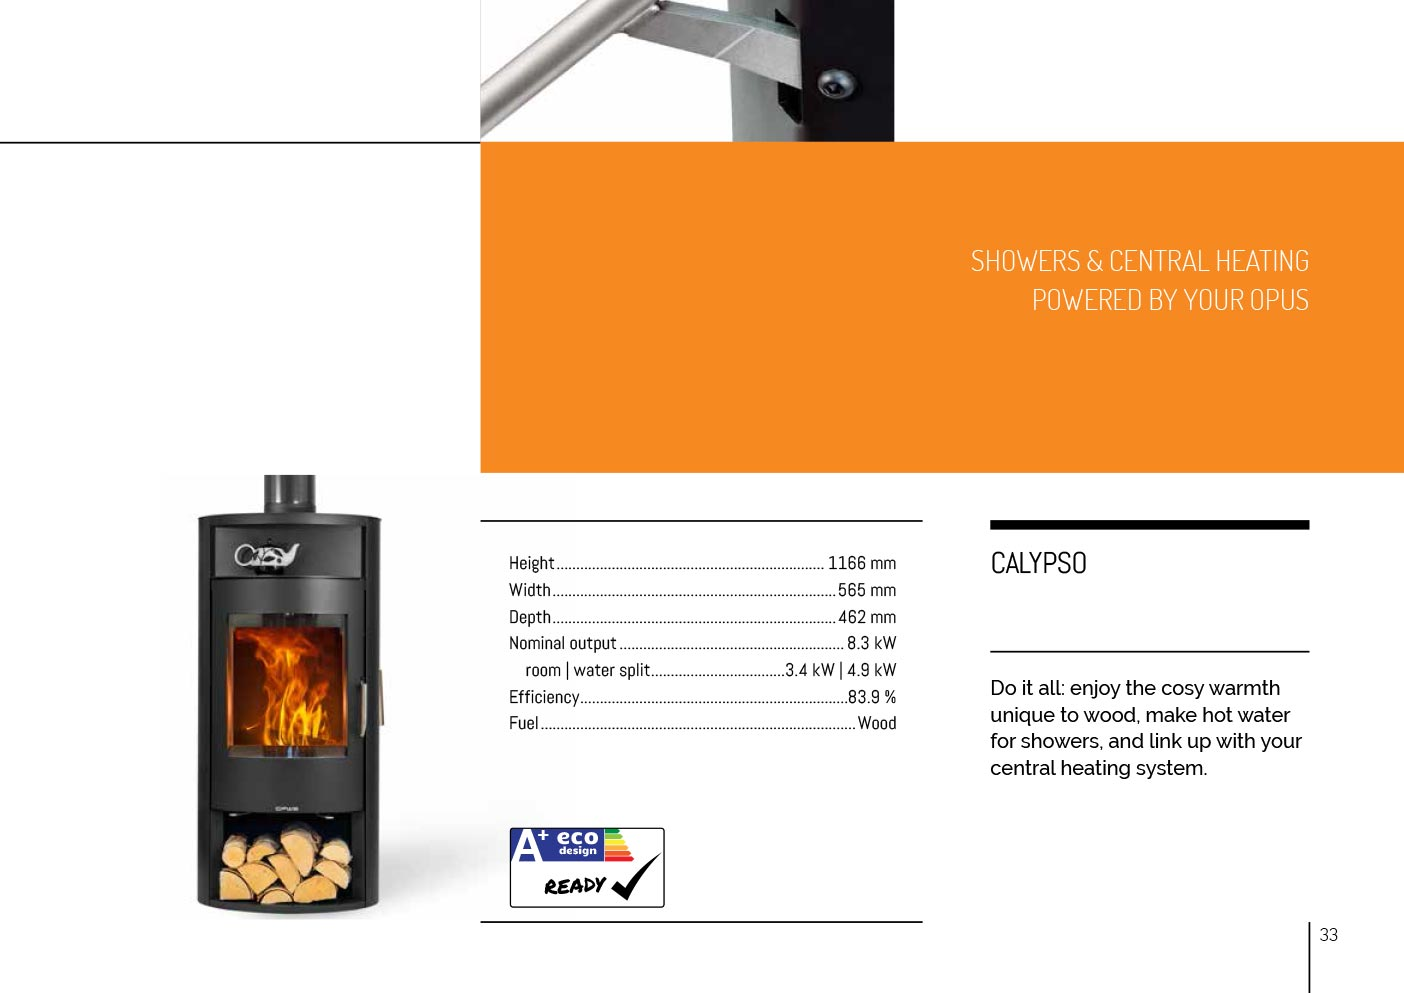 opus-stoves-brochure-(2)-33